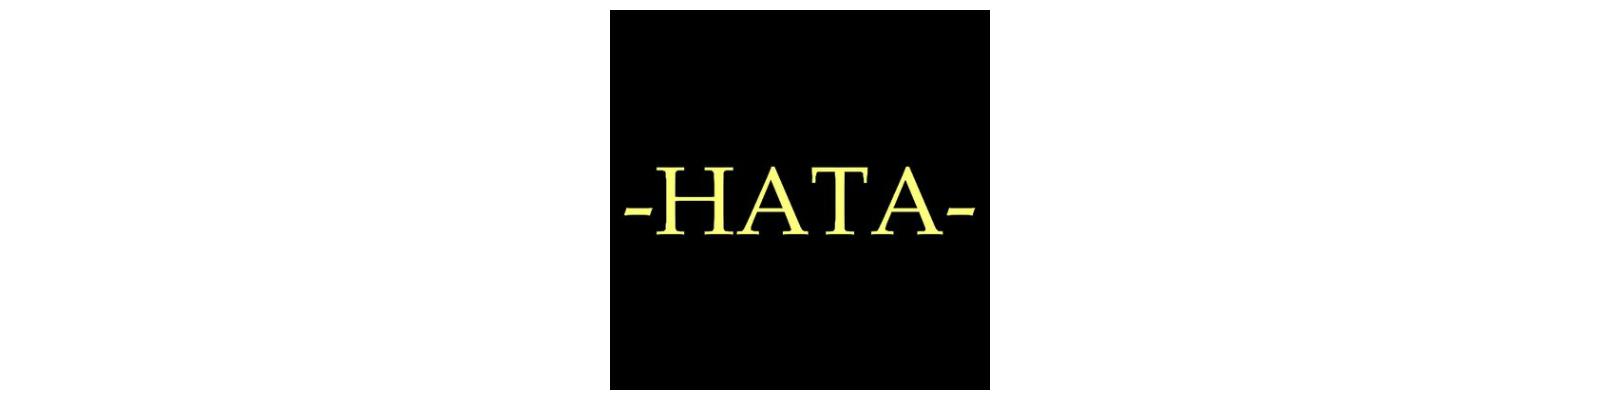 hata-logo-1600x400.jpg